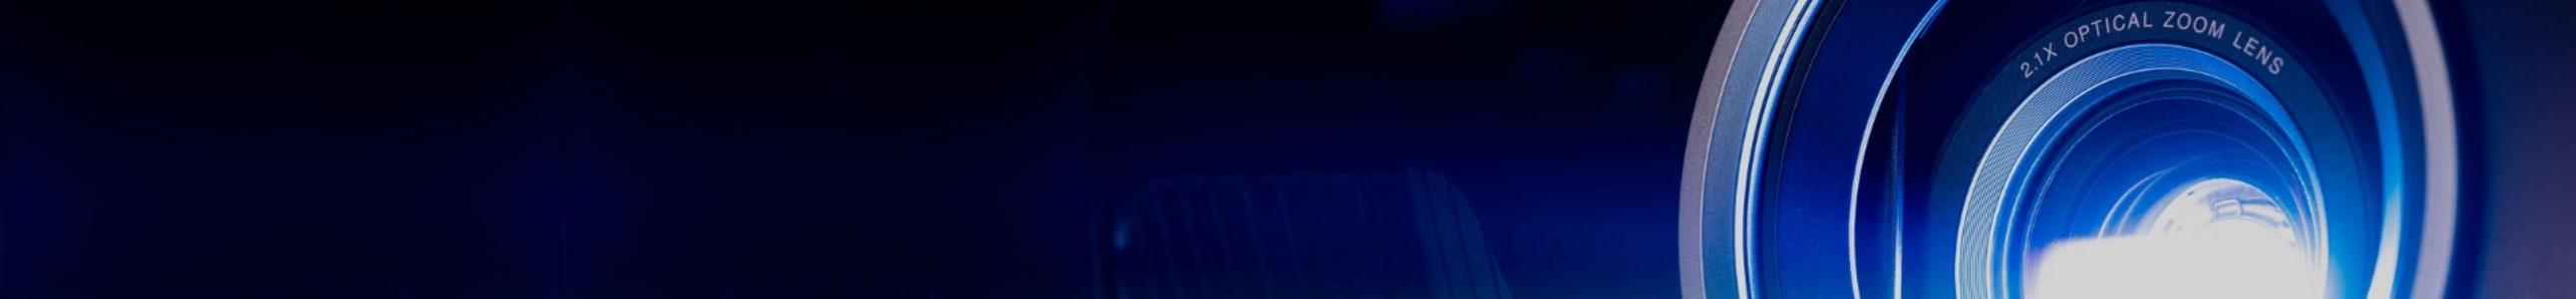 projector-brightness-banner1